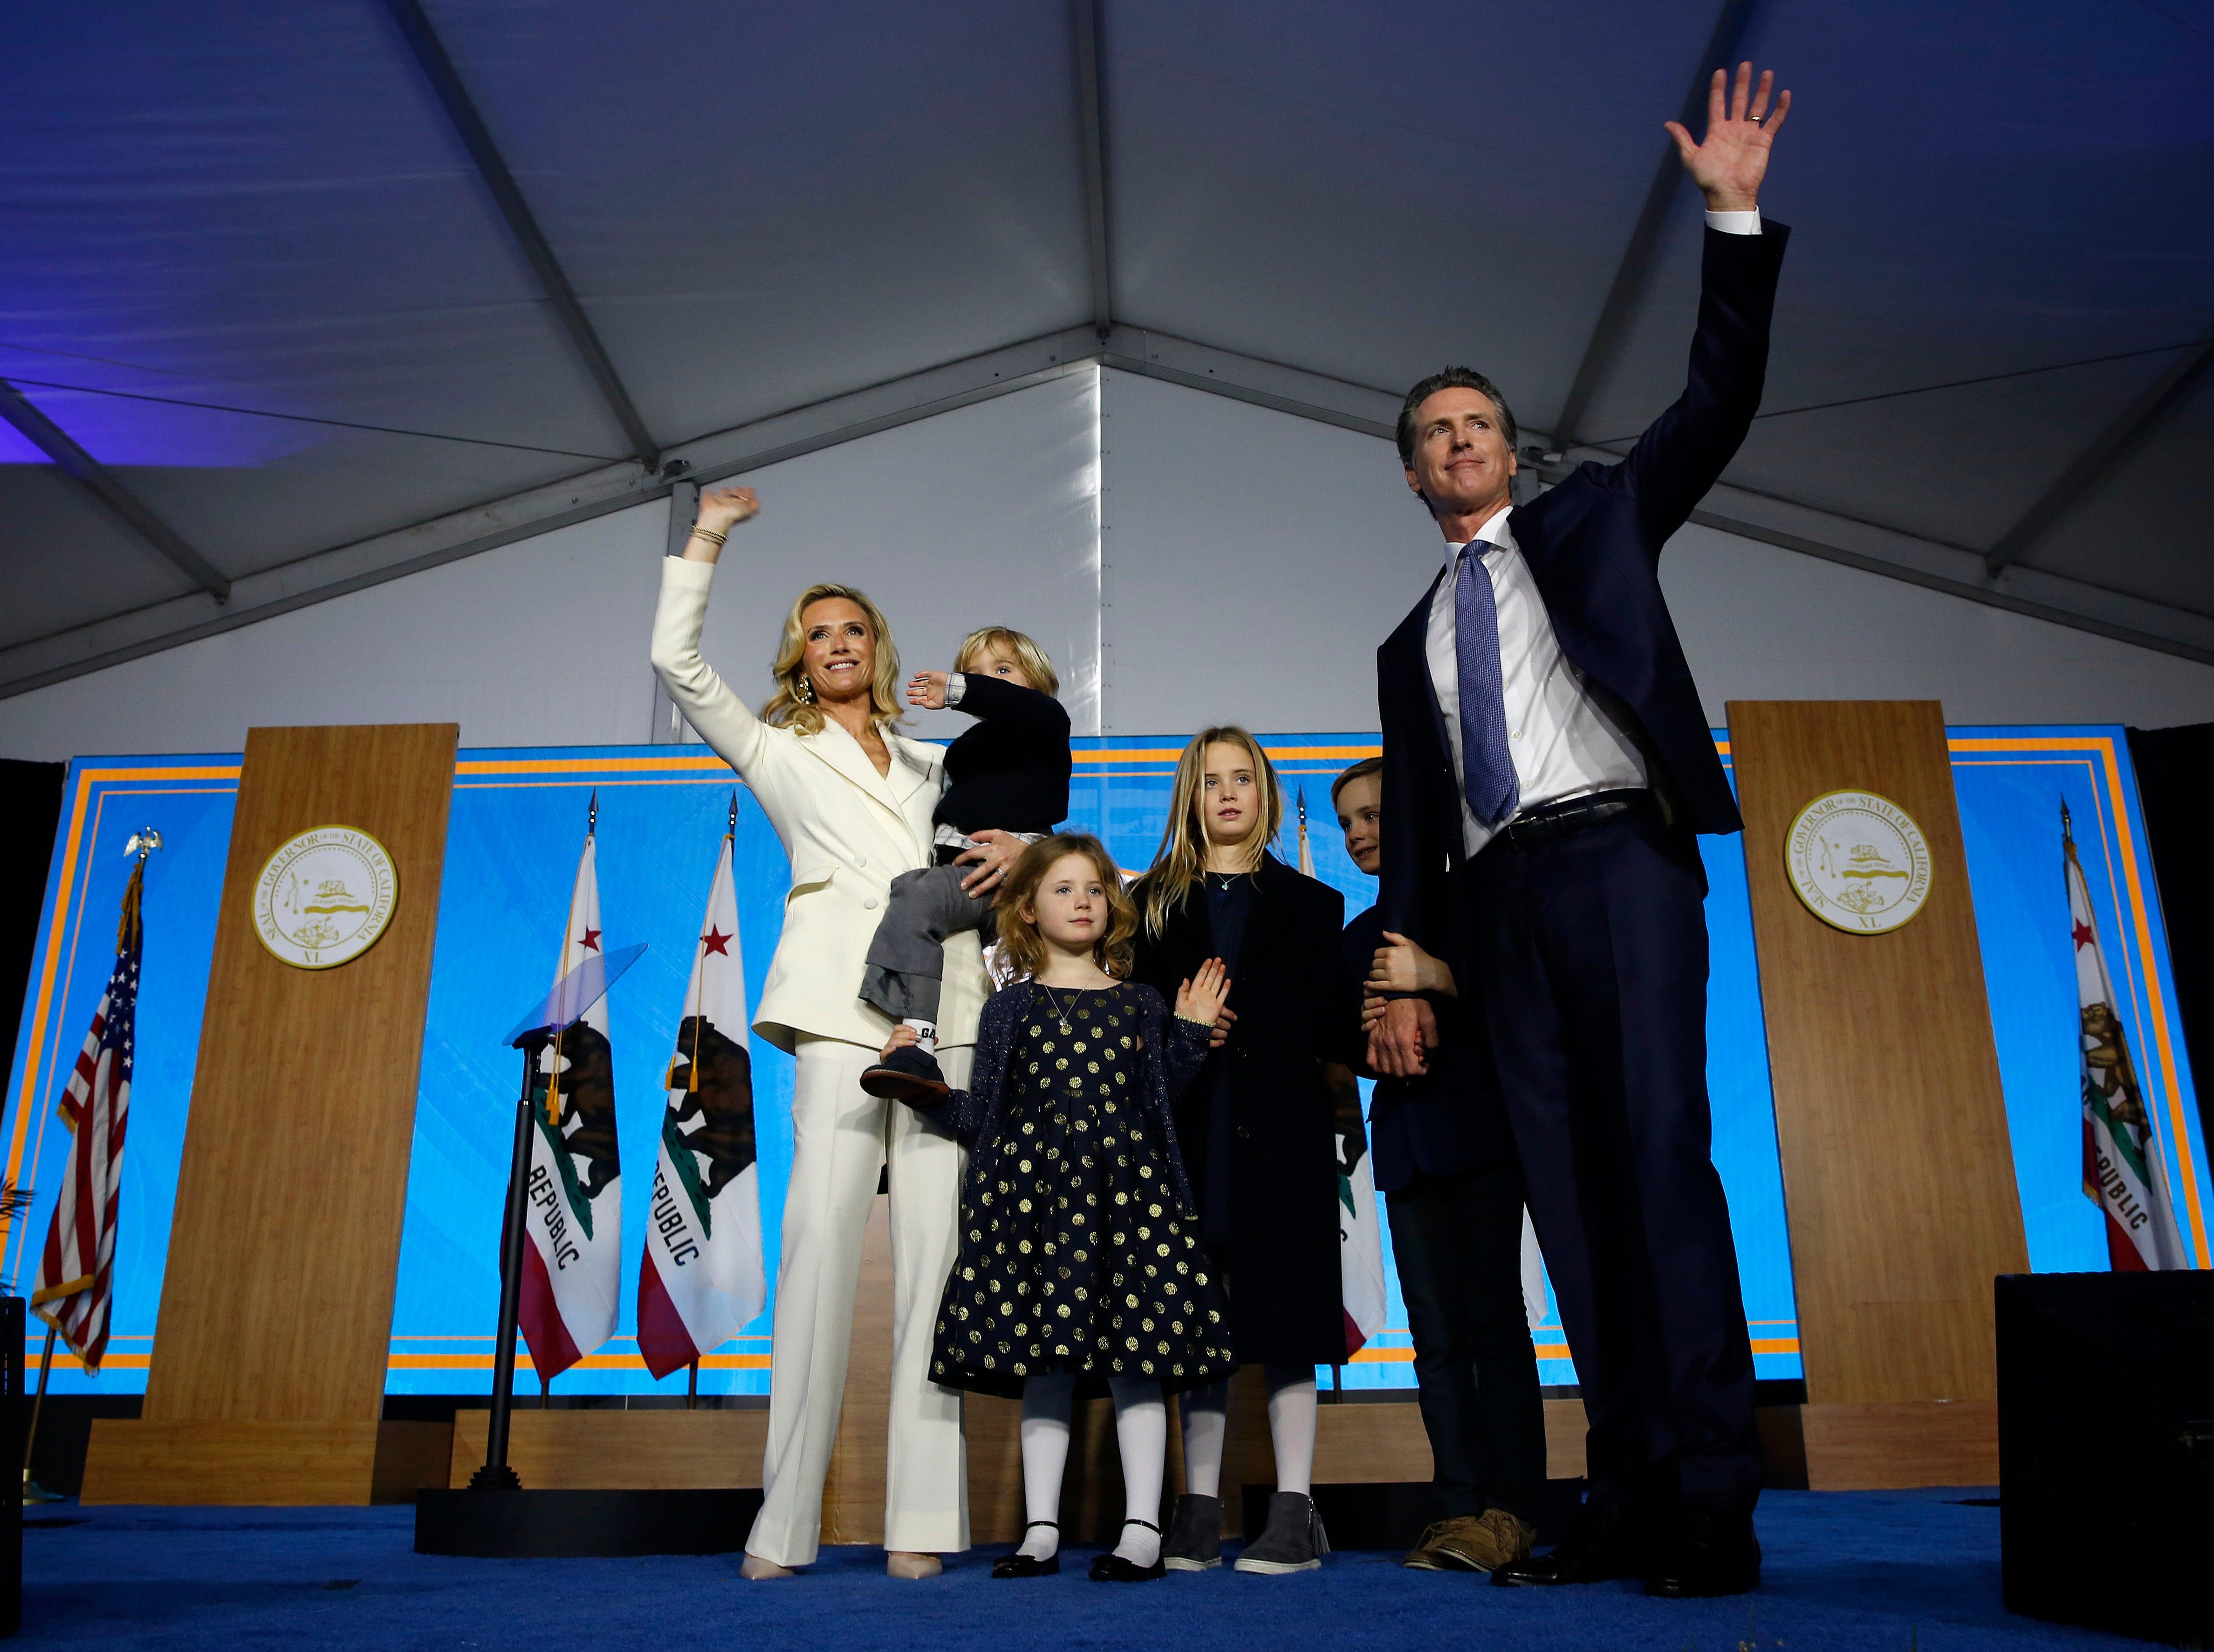 Gov. Gavin Newsom and his wife, Jennifer Siebel Newsom, wave with their children after Gavin took the oath office on  Jan. 7, 2019, in Sacramento.